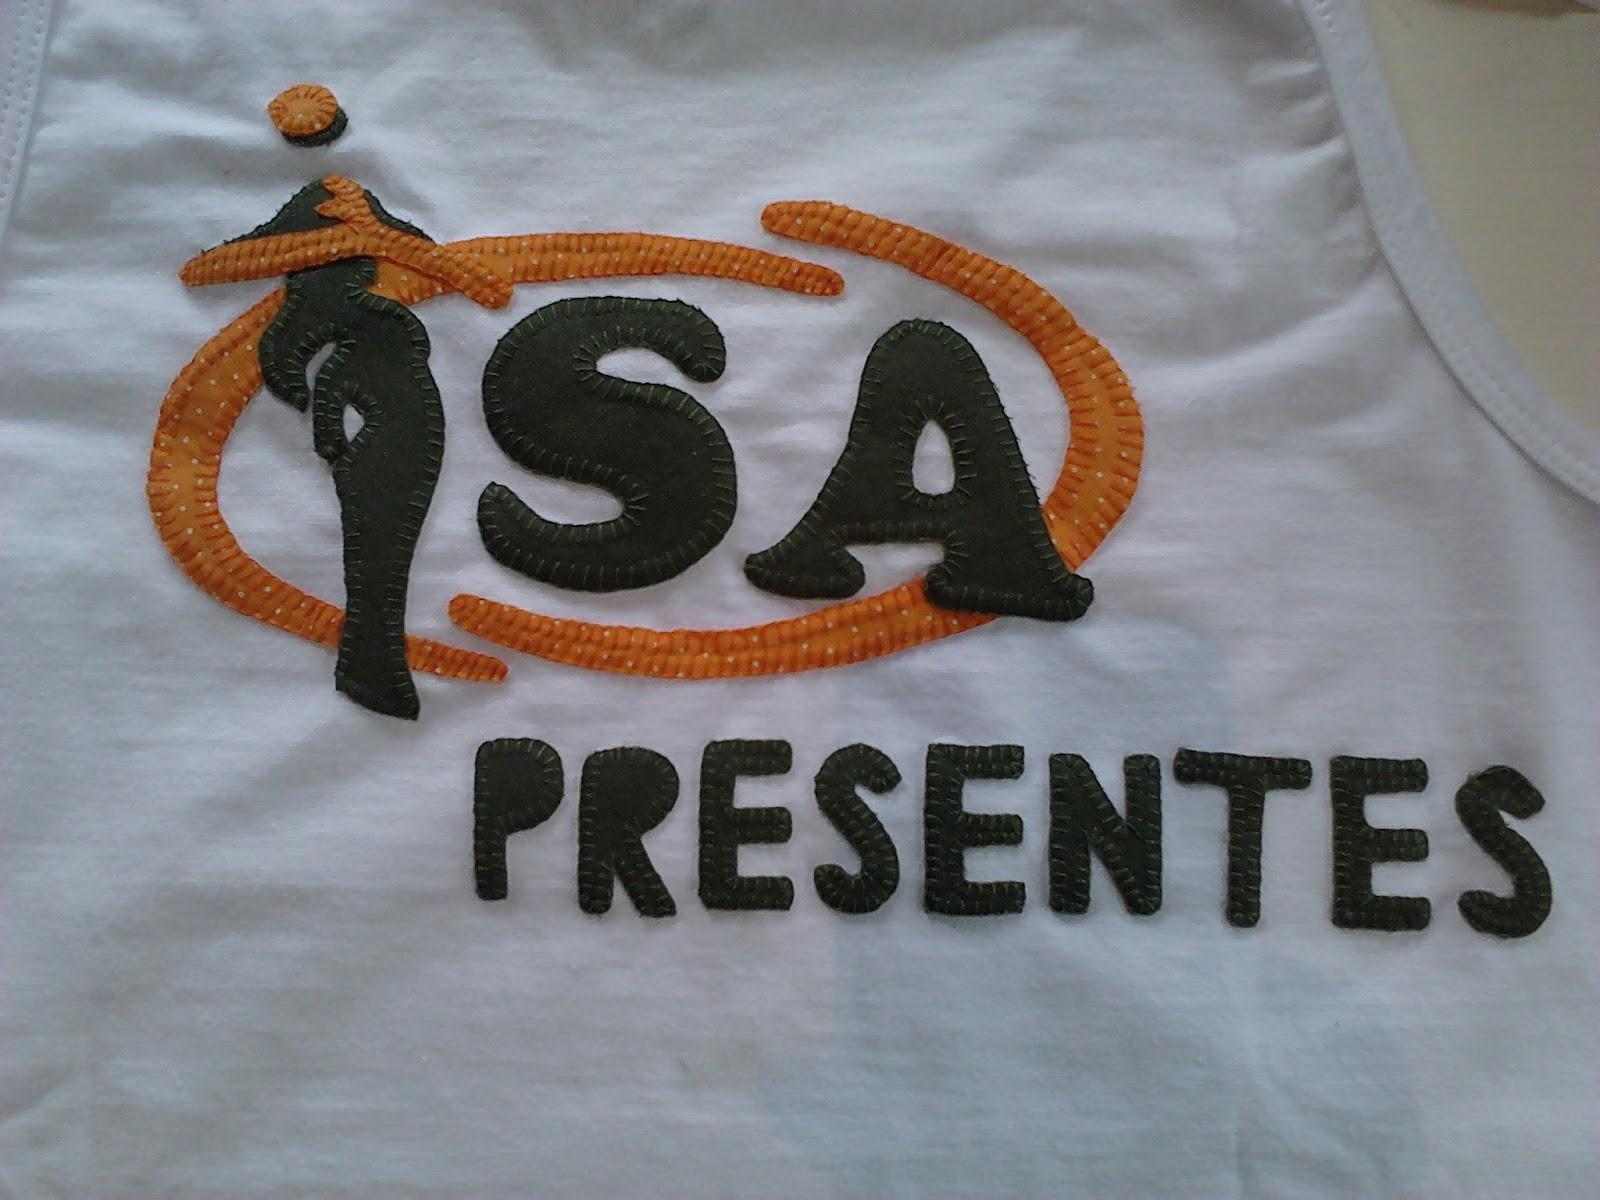 Armario Clothing Ghatkopar ~ Lú Art Mania Blusinha com slogan da loja Isa Presentes